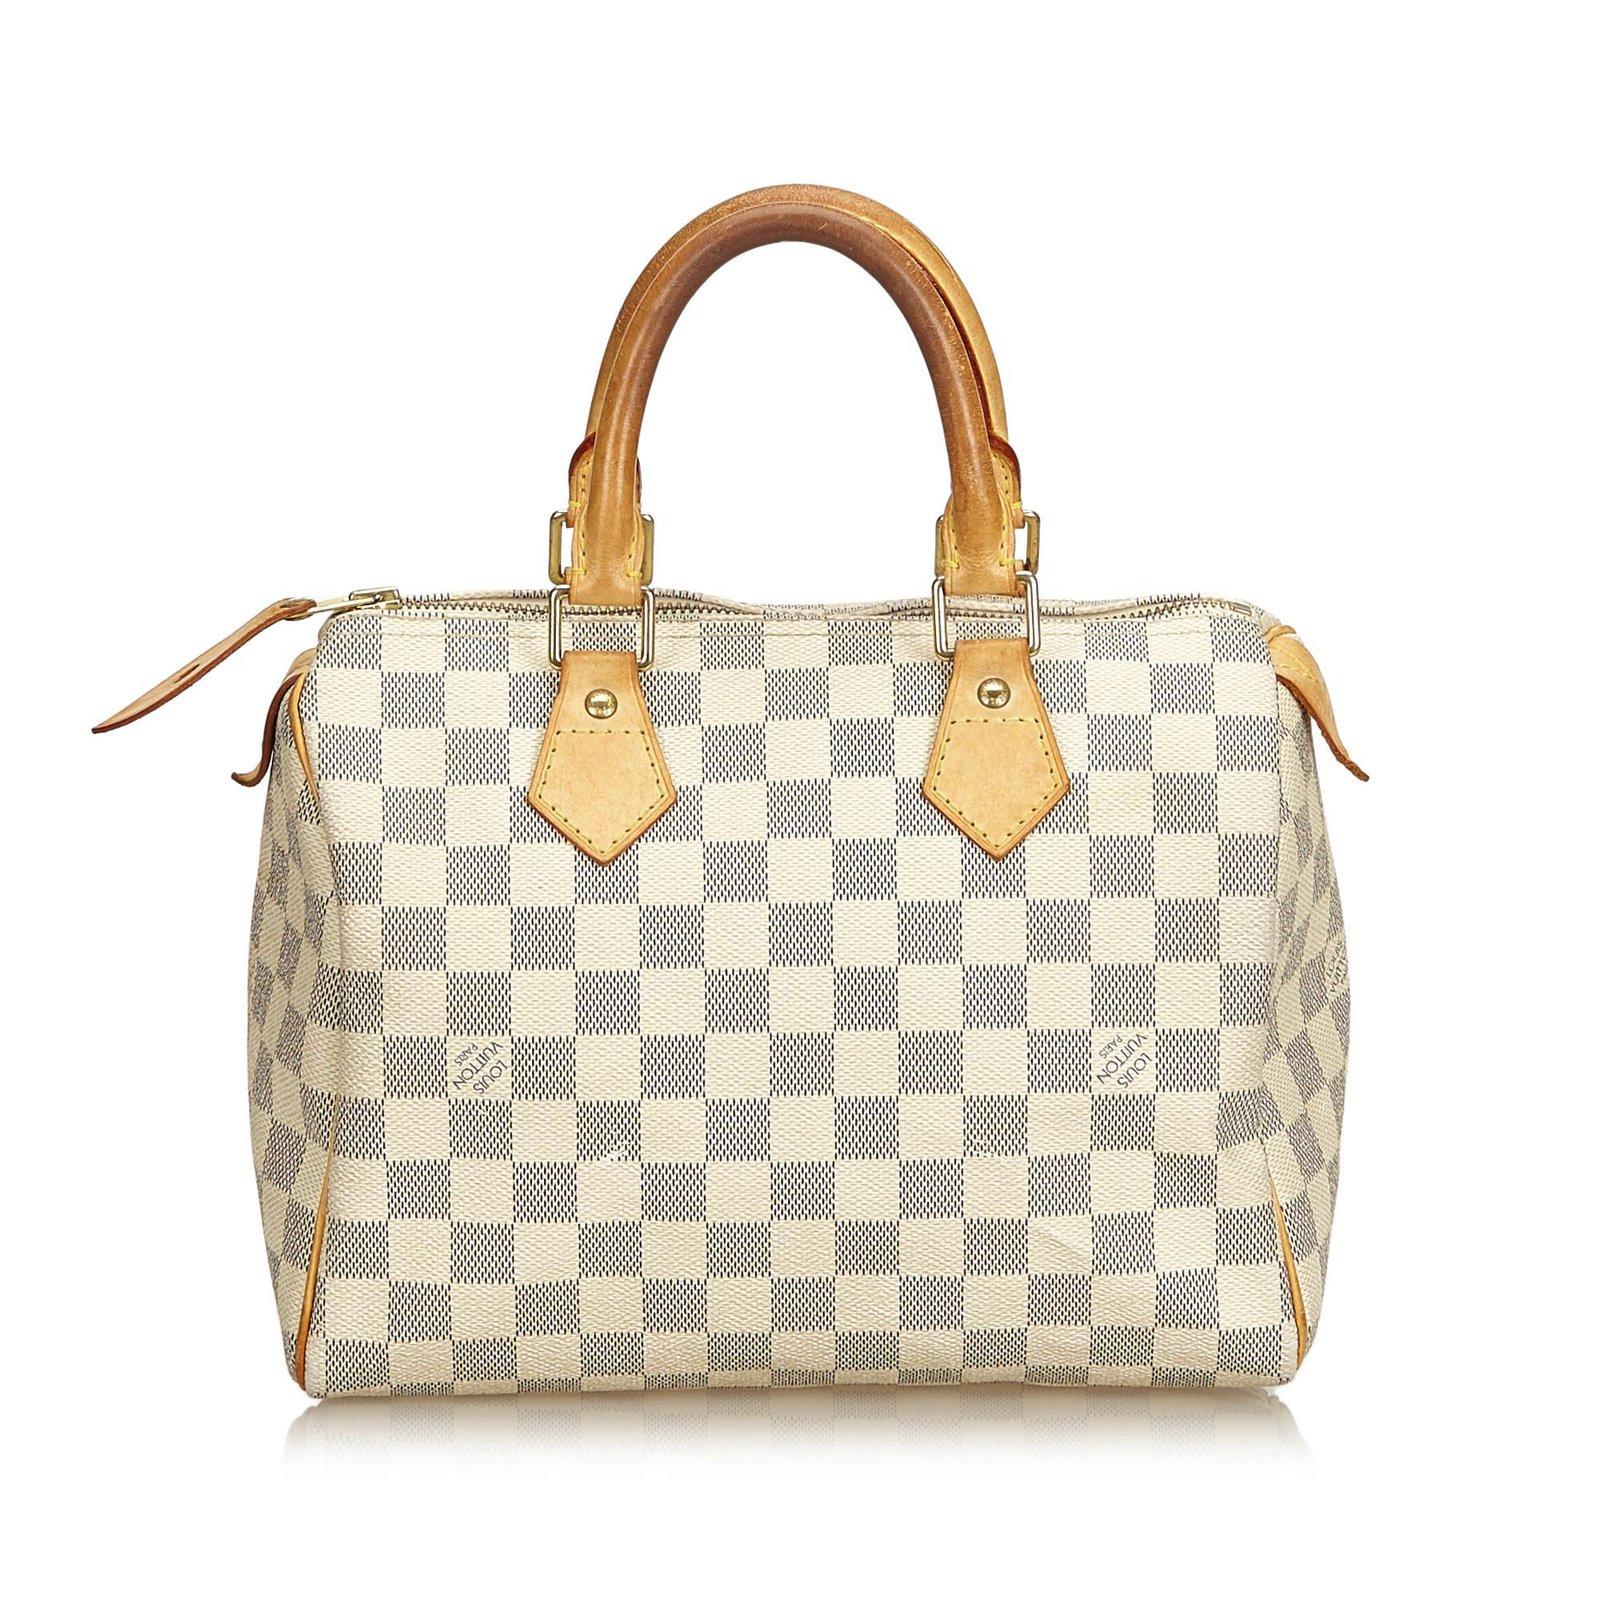 3669ef0dc9a Louis Vuitton Damier Azur Speedy 25 Handbags Leather